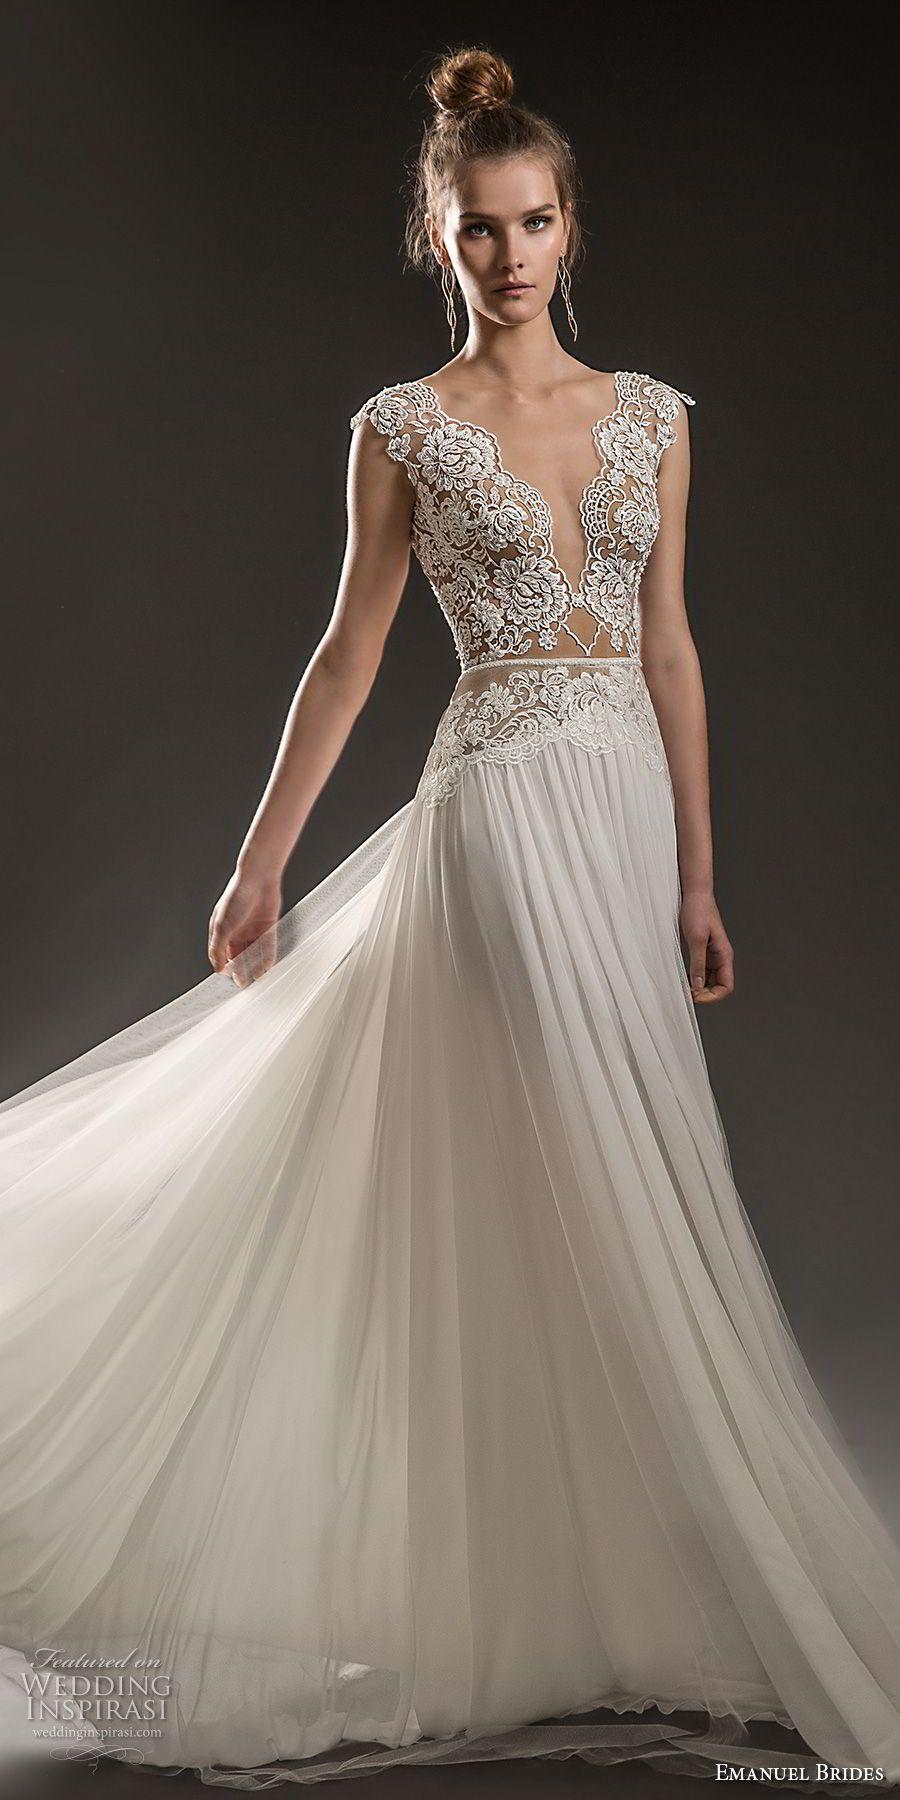 Emanuel brides wedding dresses bodice romantic and wedding dress